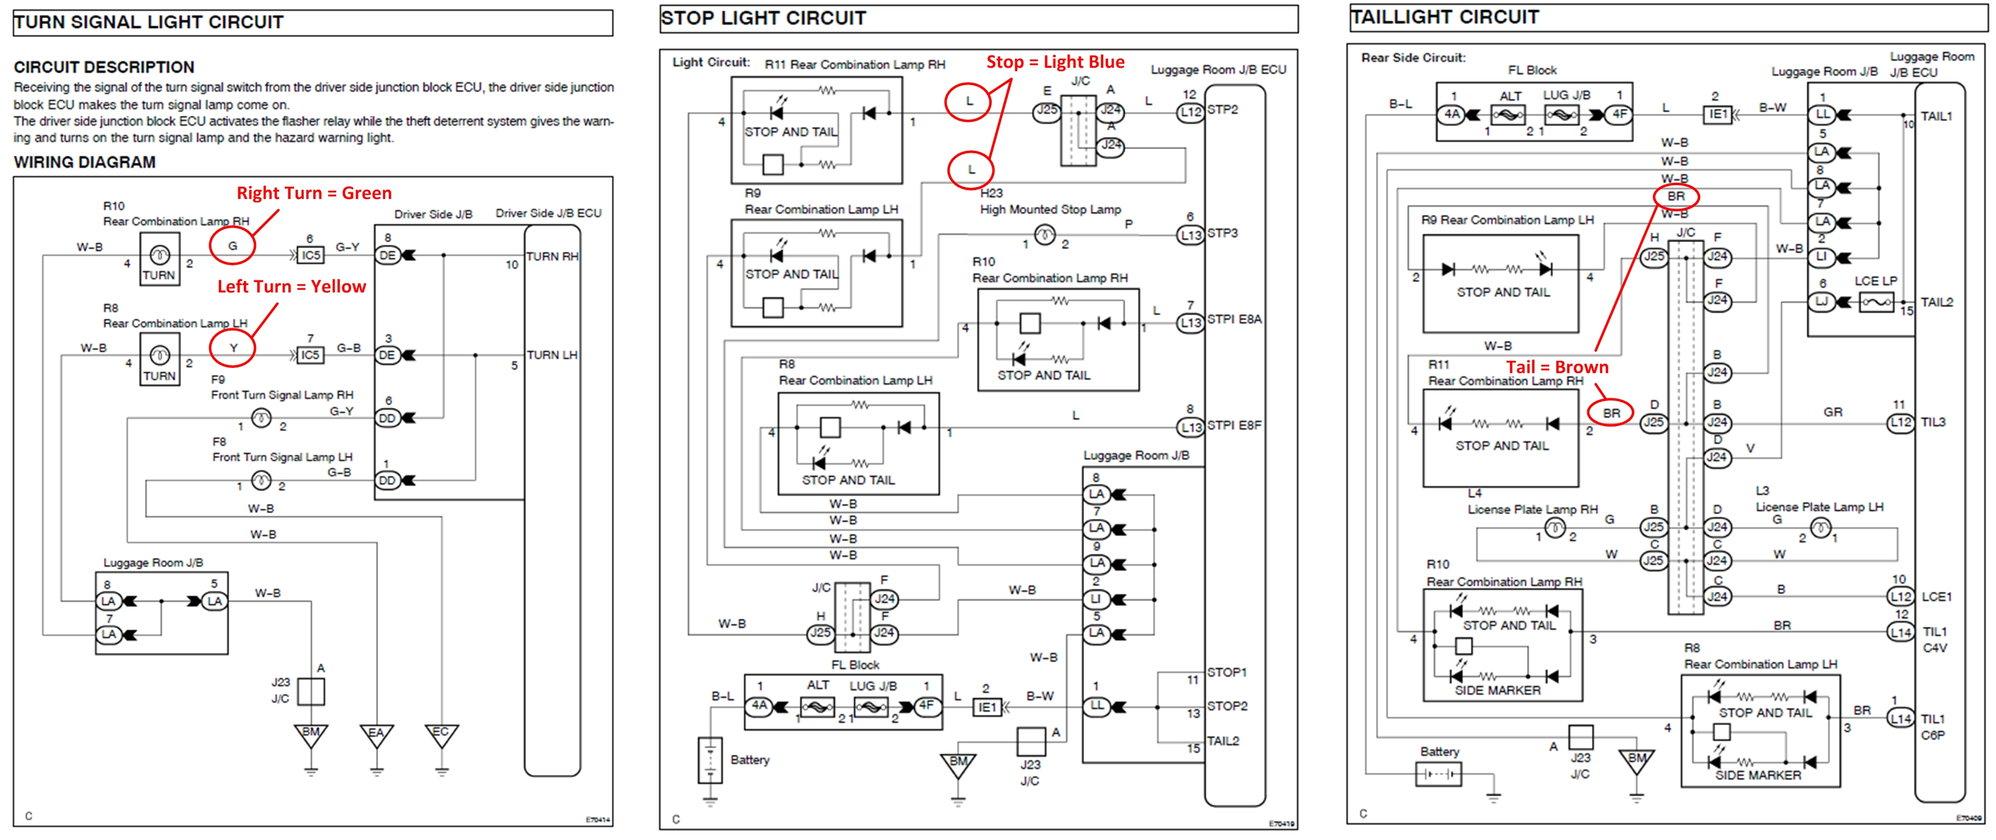 Trailer Tail Light Wiring Diagram Also Tail Light Wiring Diagram